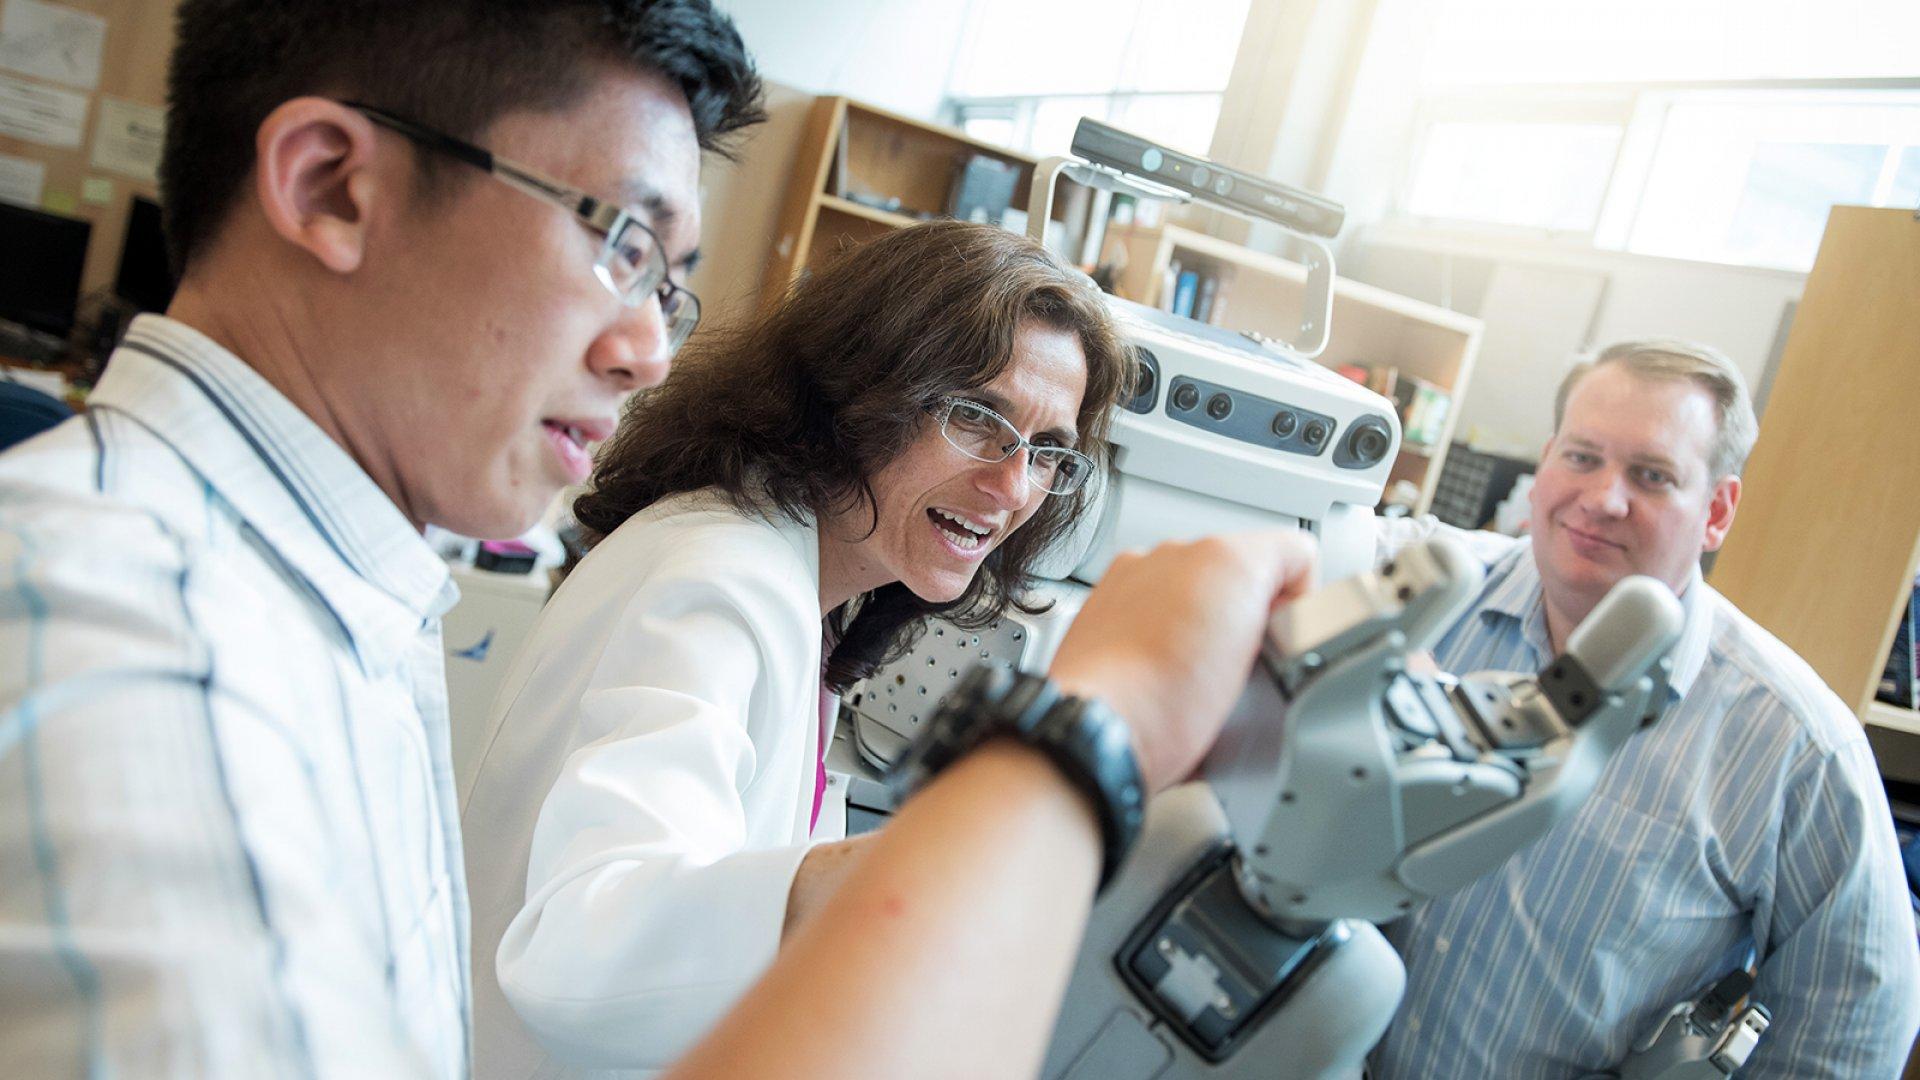 Mechanical engineering professor Elizabeth Croft (center) and her team are training robots to work alongside humans